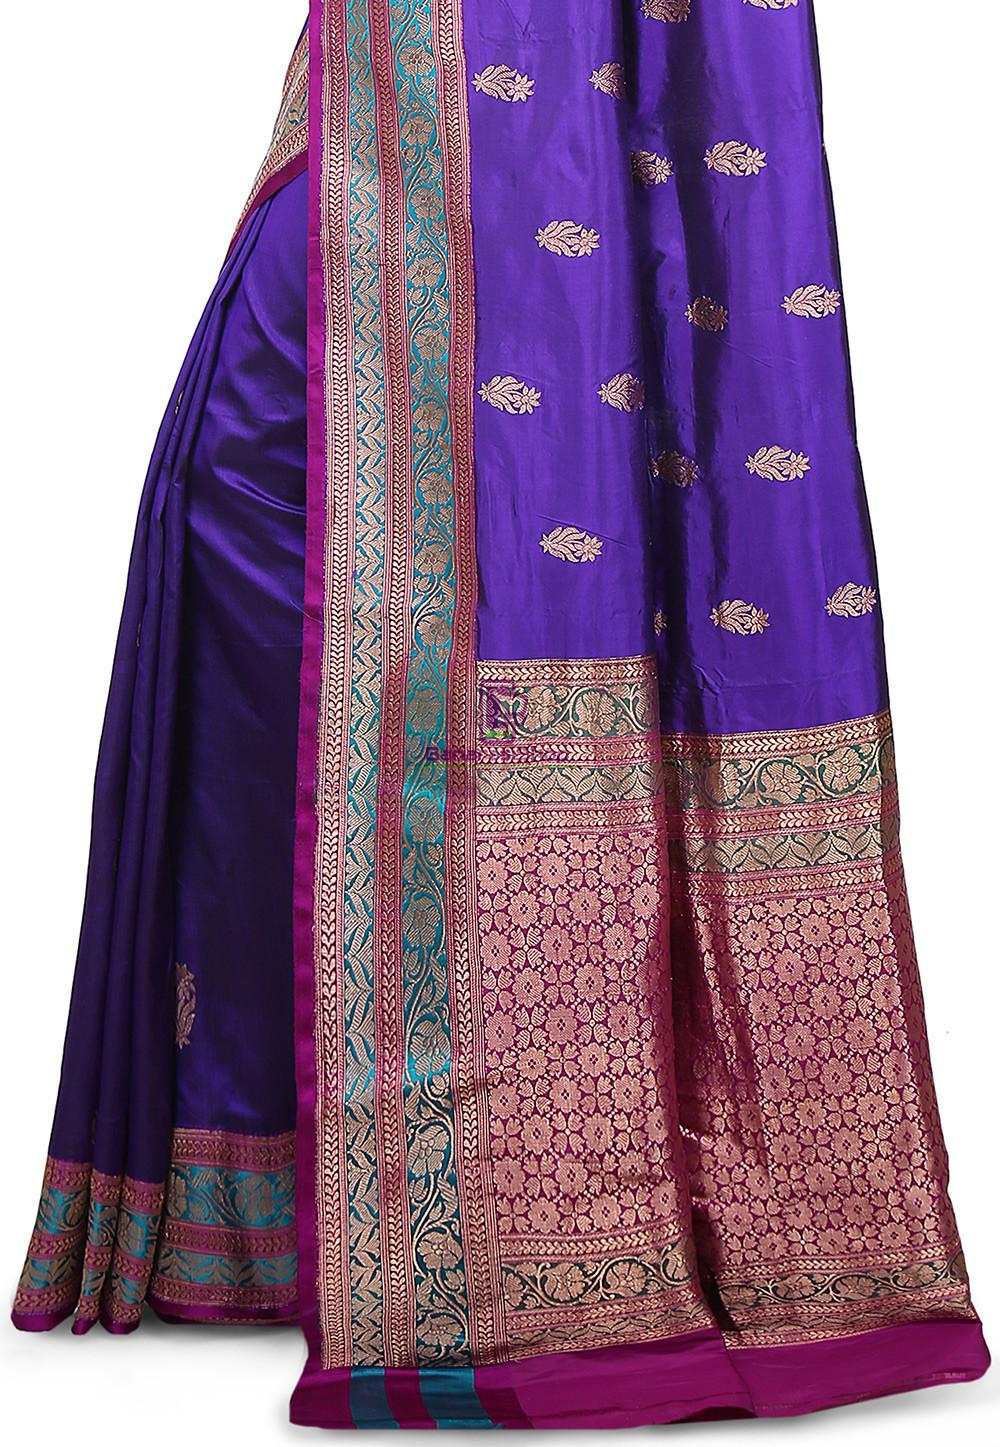 Banarasi Pure Katan Silk Handloom Saree in Indigo 3